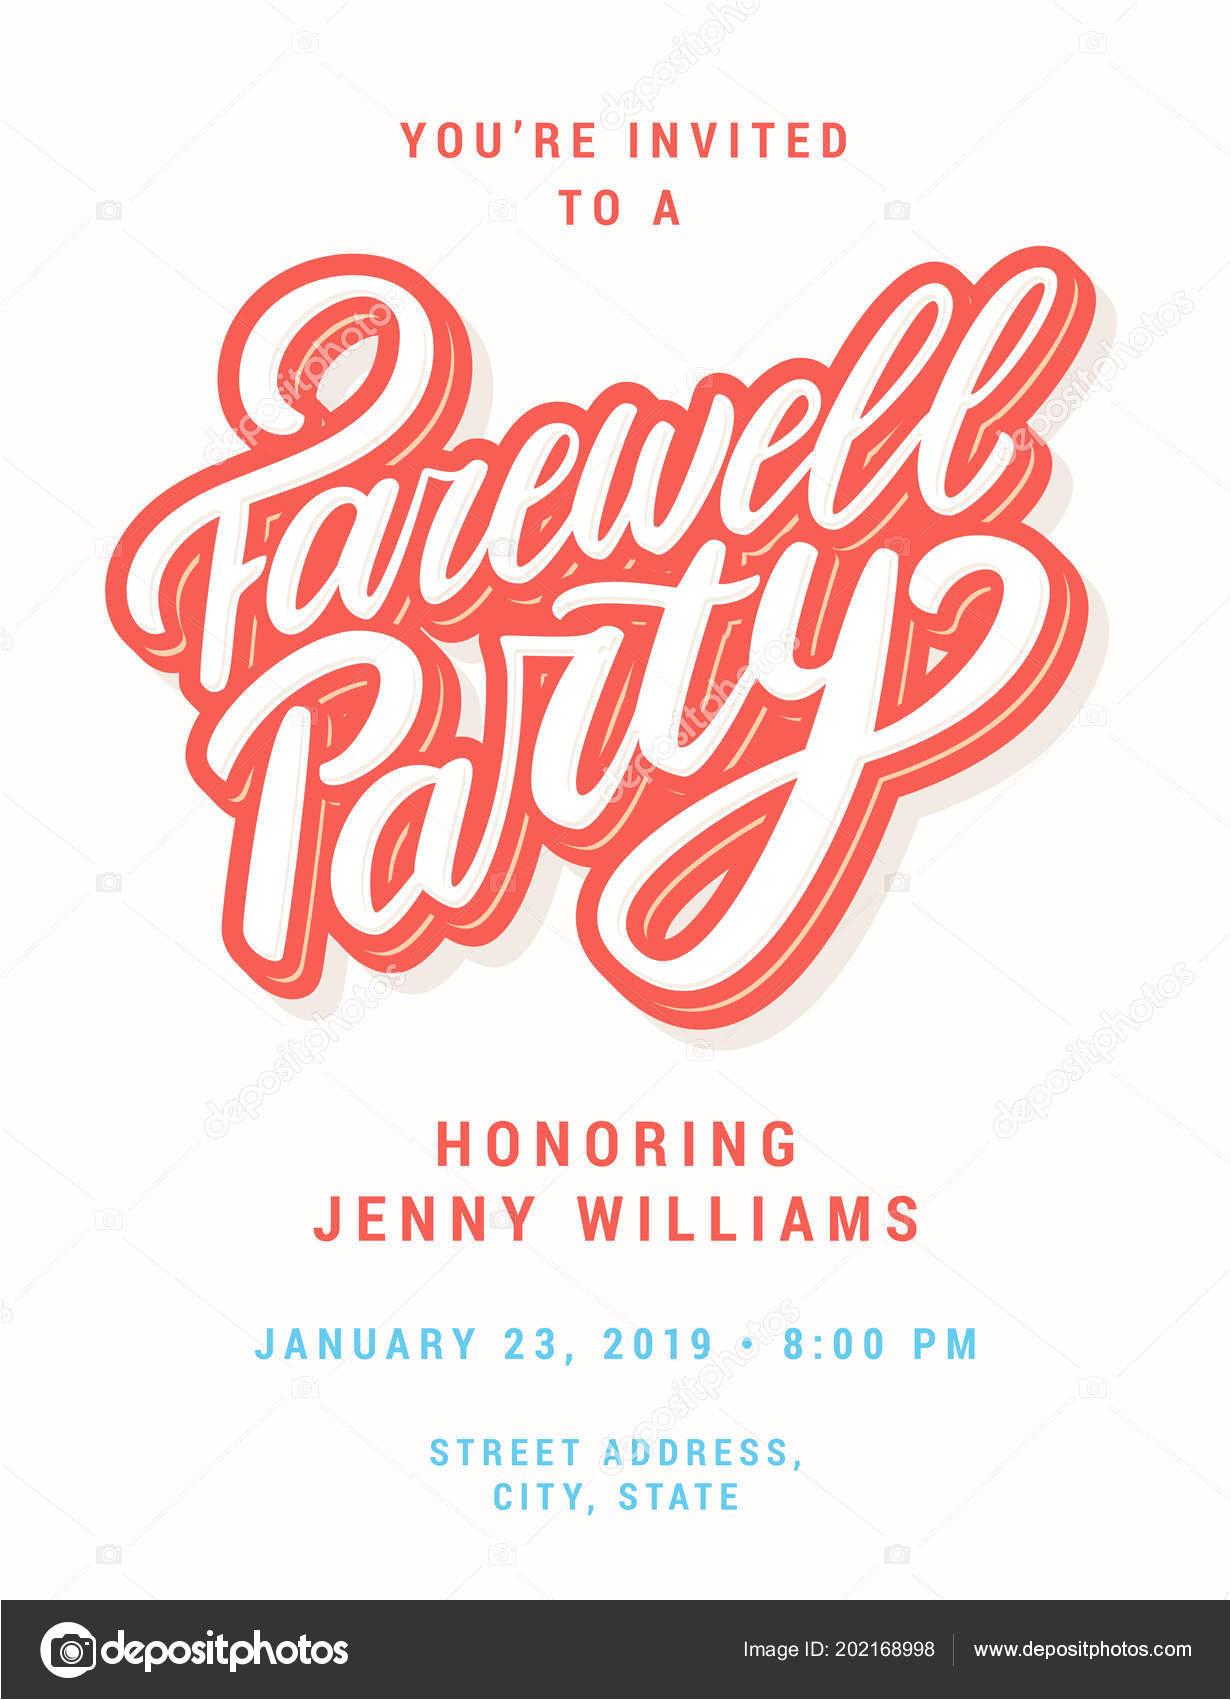 depositphotos 202168998 stock illustration farewell party invitation jpg